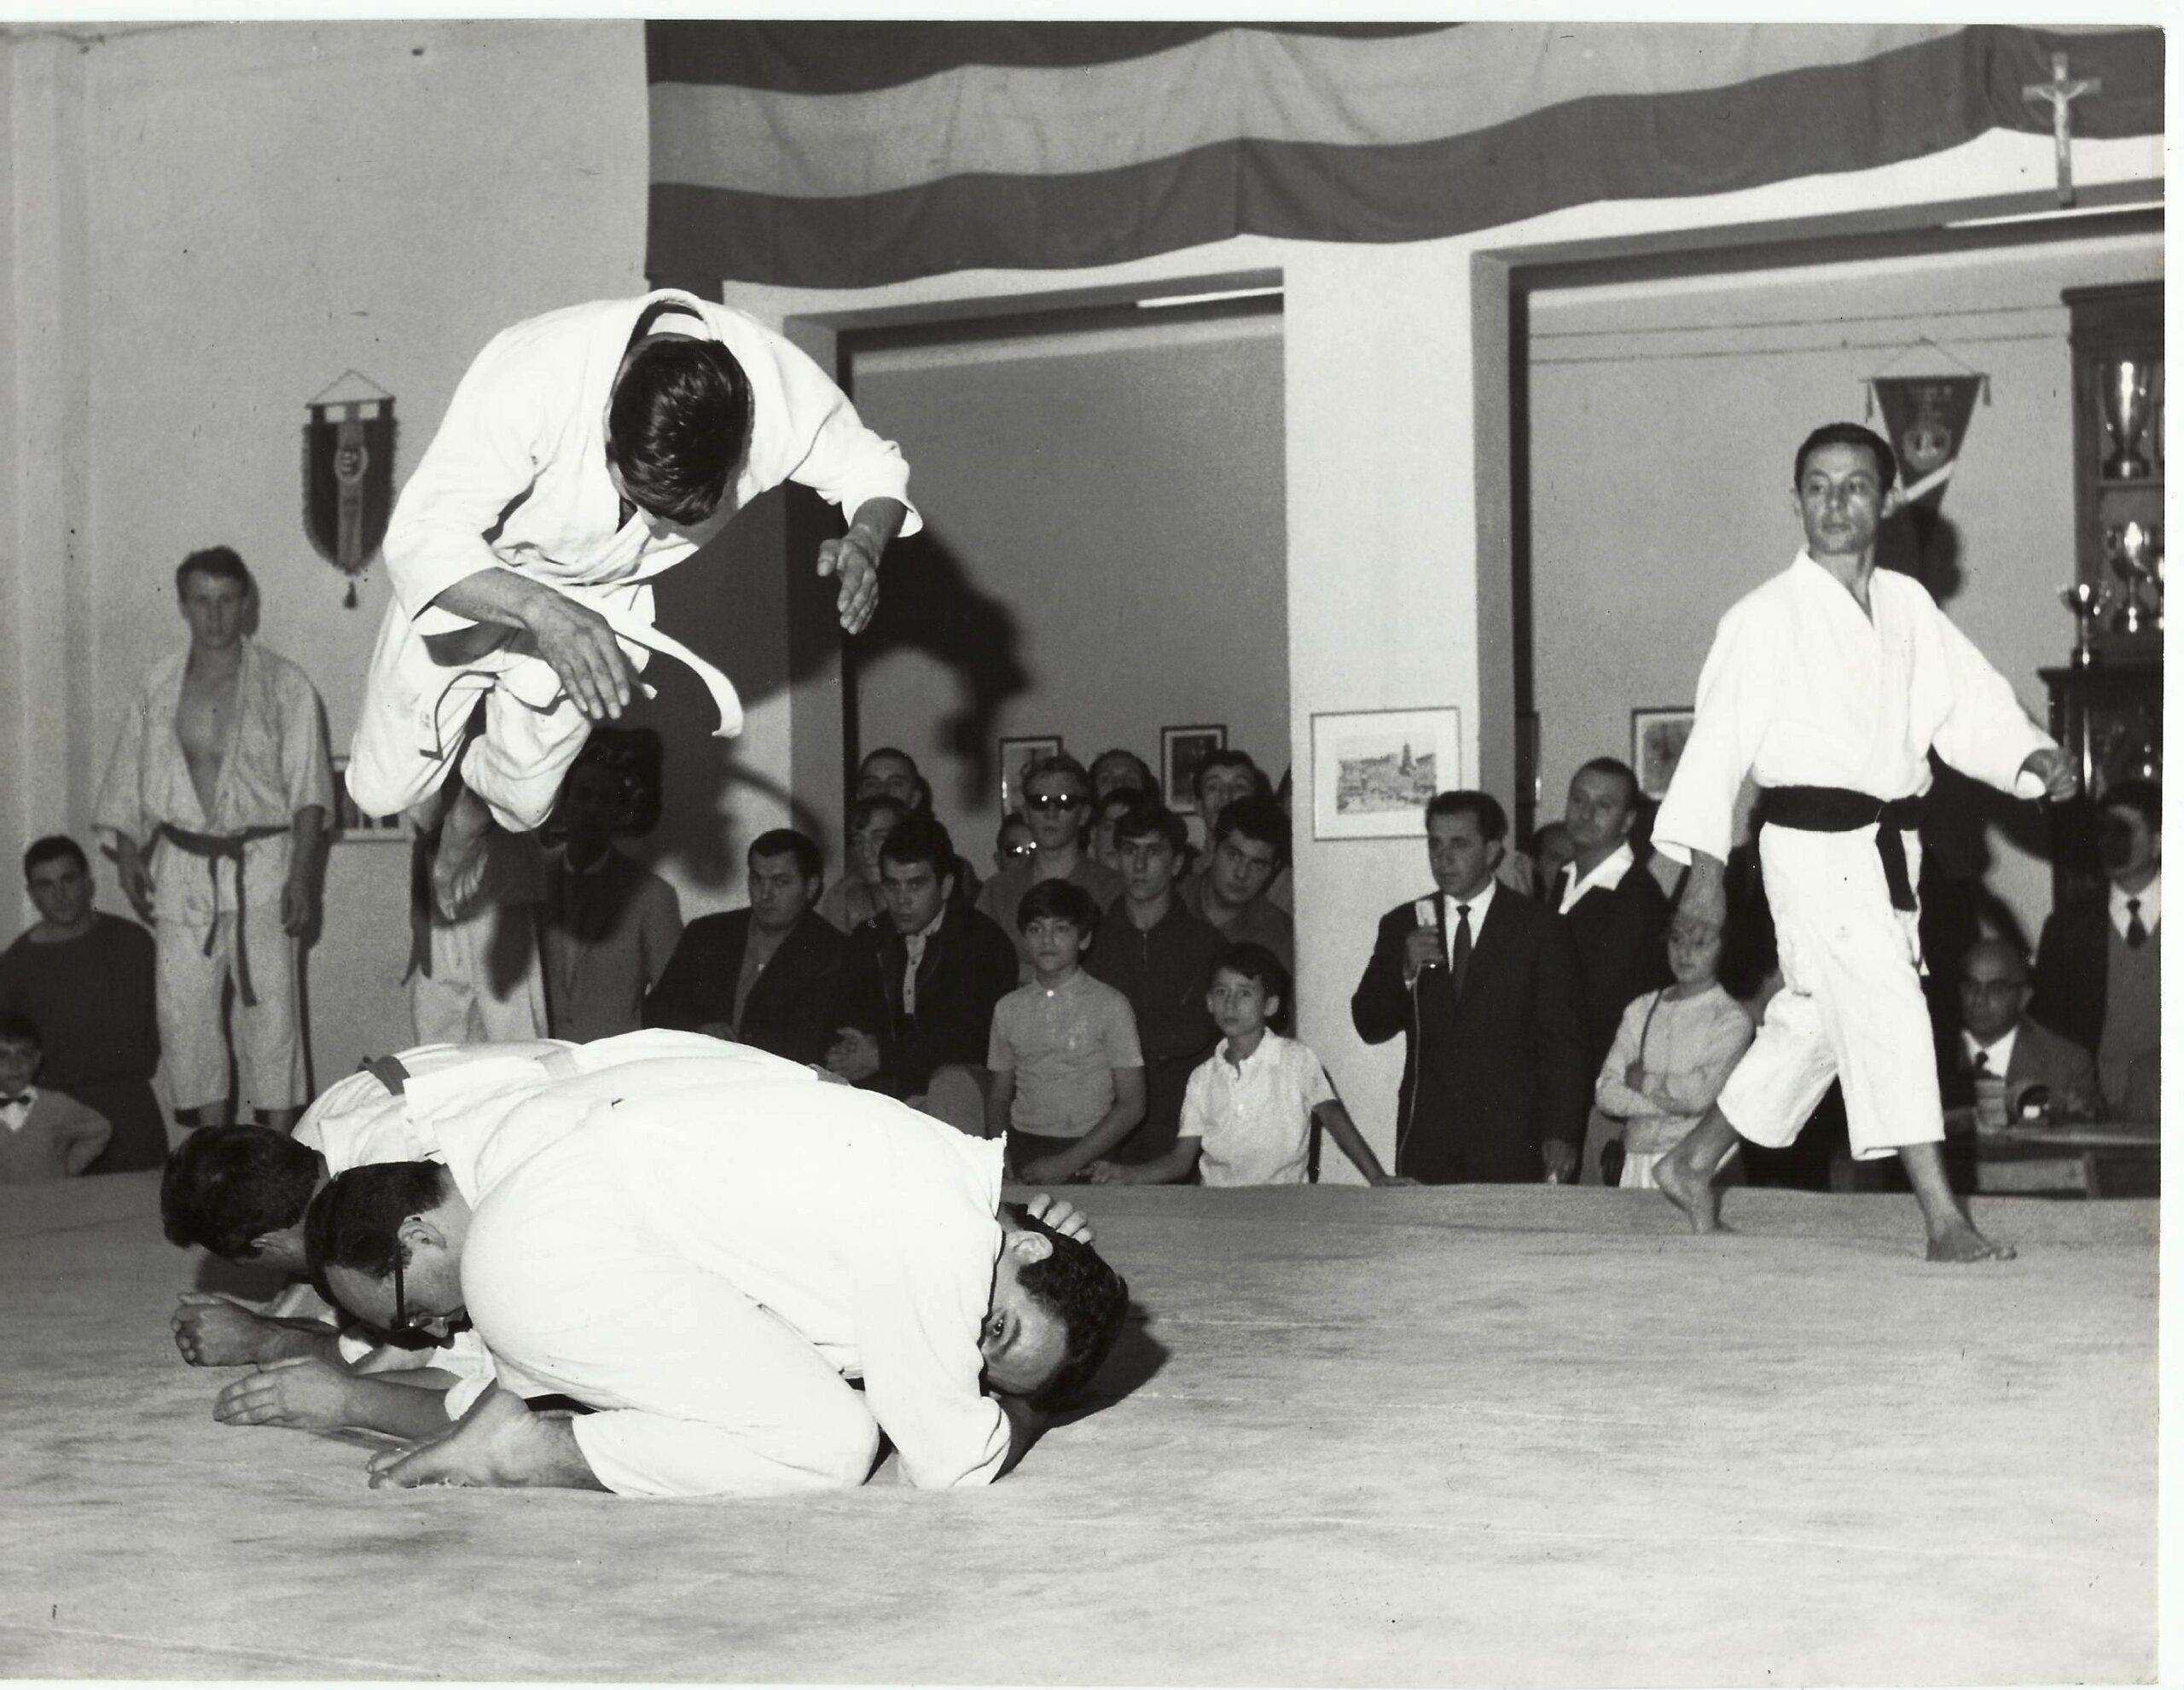 1965 acrobazie lotta giapponese